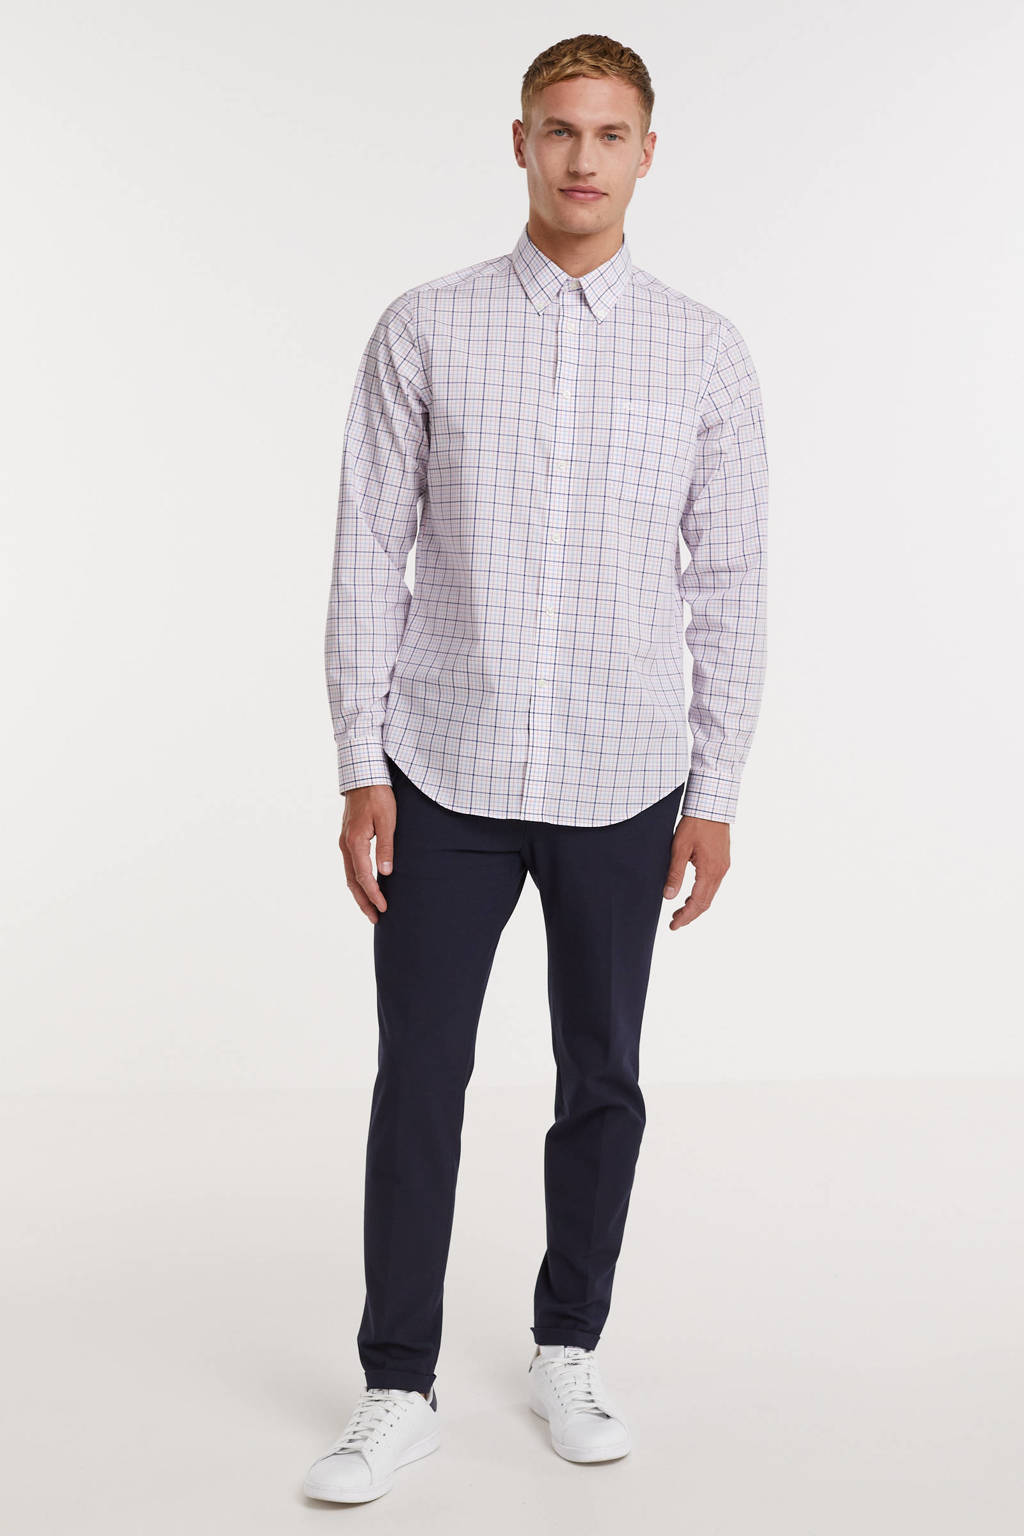 POLO Ralph Lauren geruite slim fit overhemd roze/wit/blauw, Roze/wit/blauw